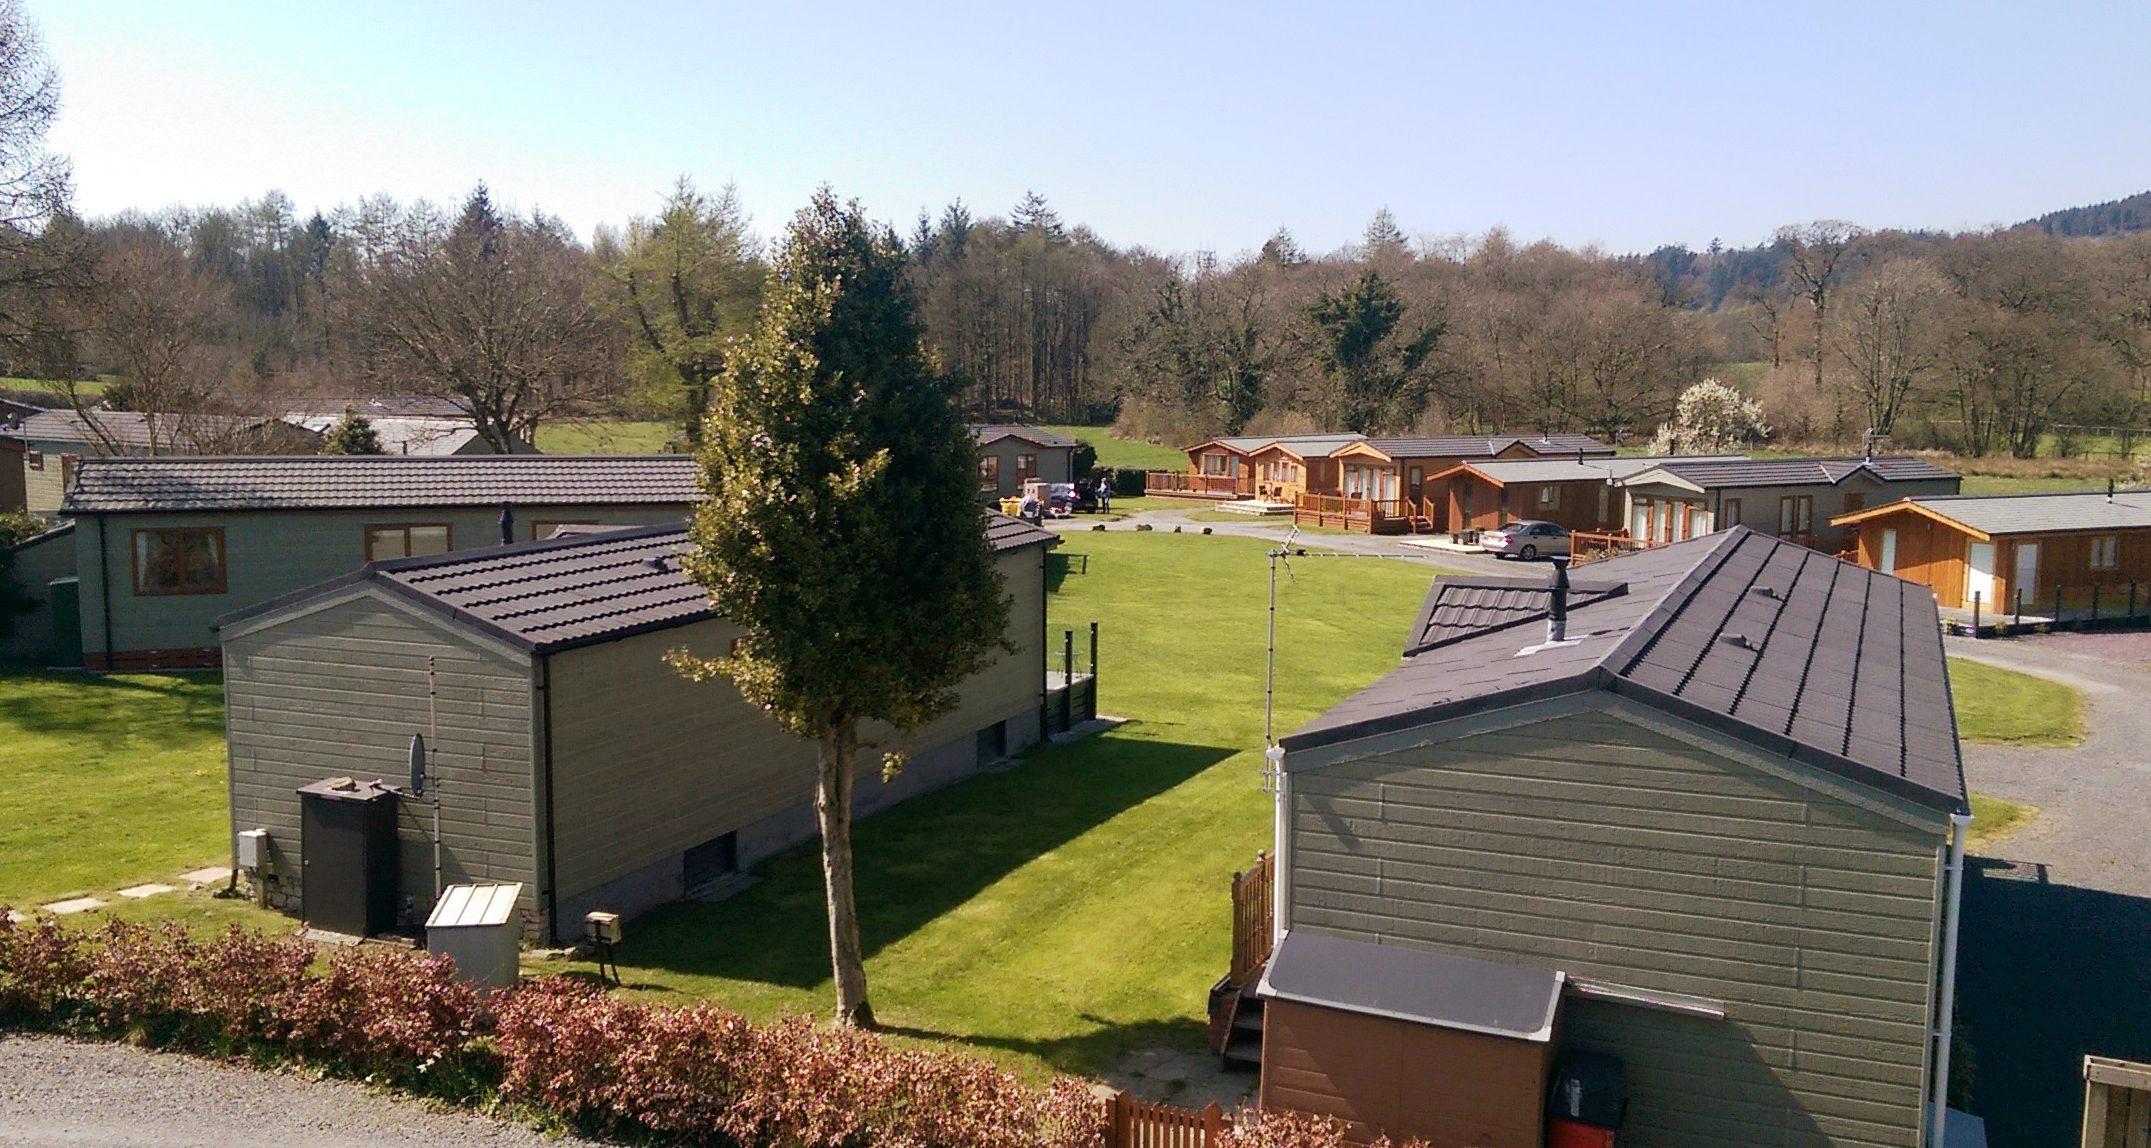 Cartmel Lodge Park